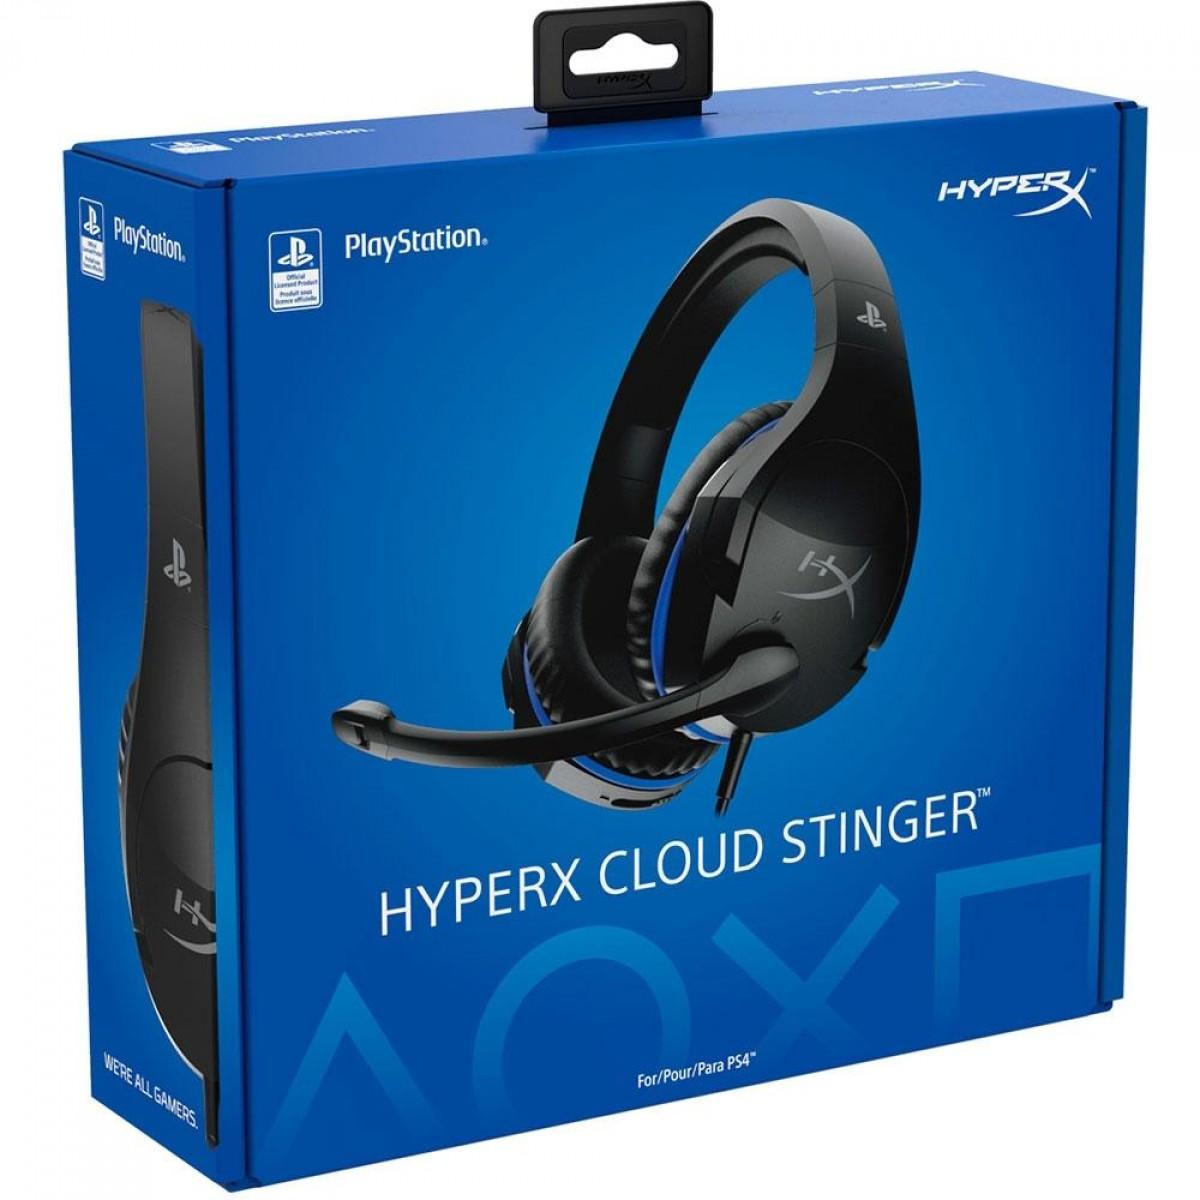 Headset Gamer HyperX Cloud Stinger, Drivers 50mm, PS5 e PS4, P3, Black/Blue, HX-HSCSS-BK/AM